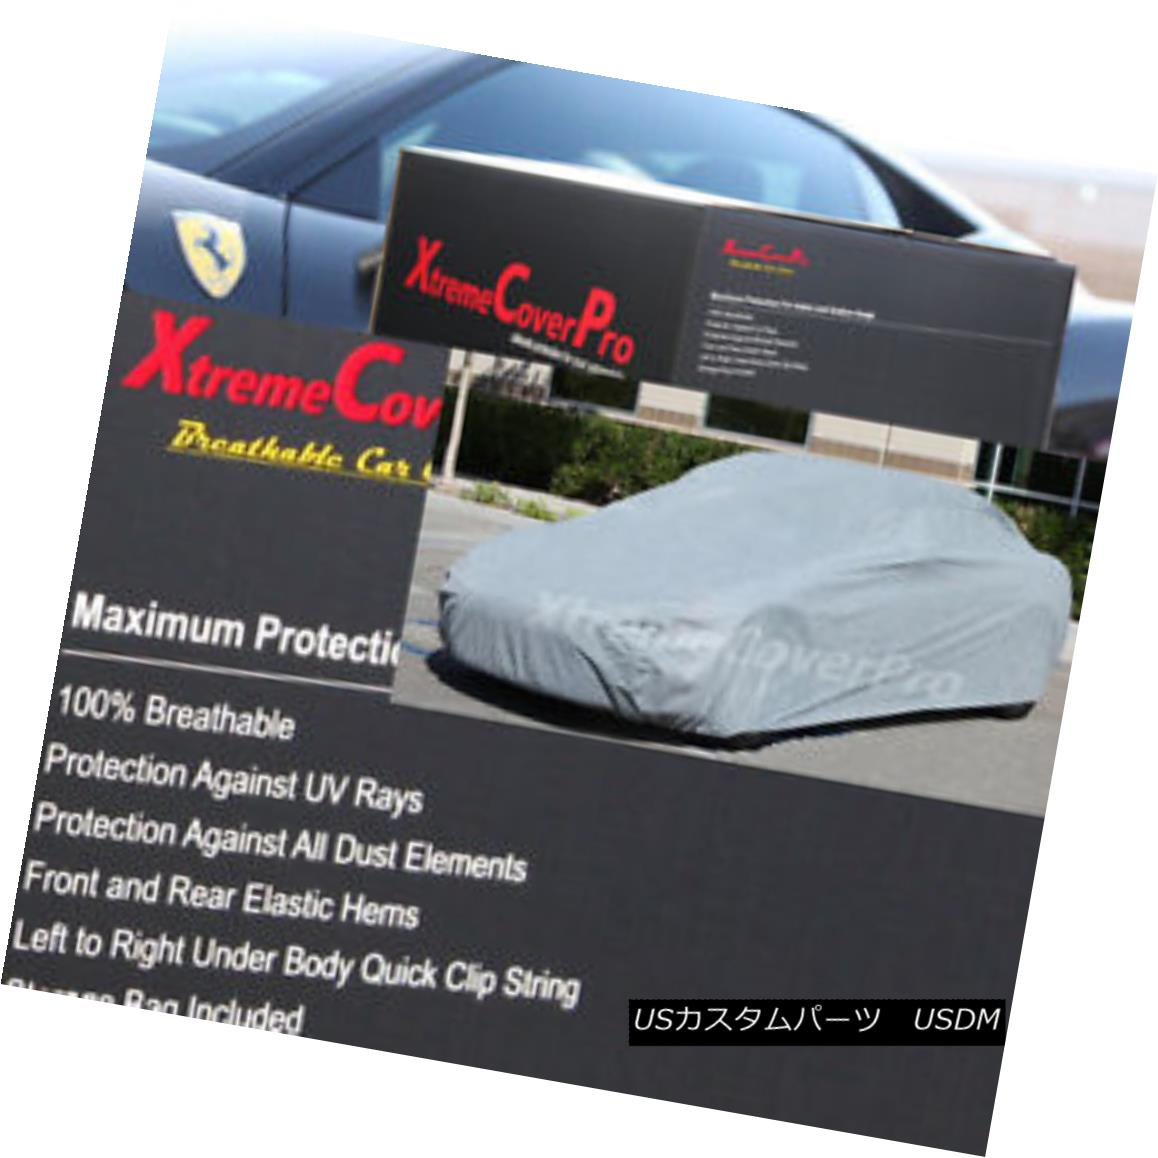 2004 2005 2006 Mazda Mazda3 5-Door Hatchback Breathable Car Cover w//MirrorPocket